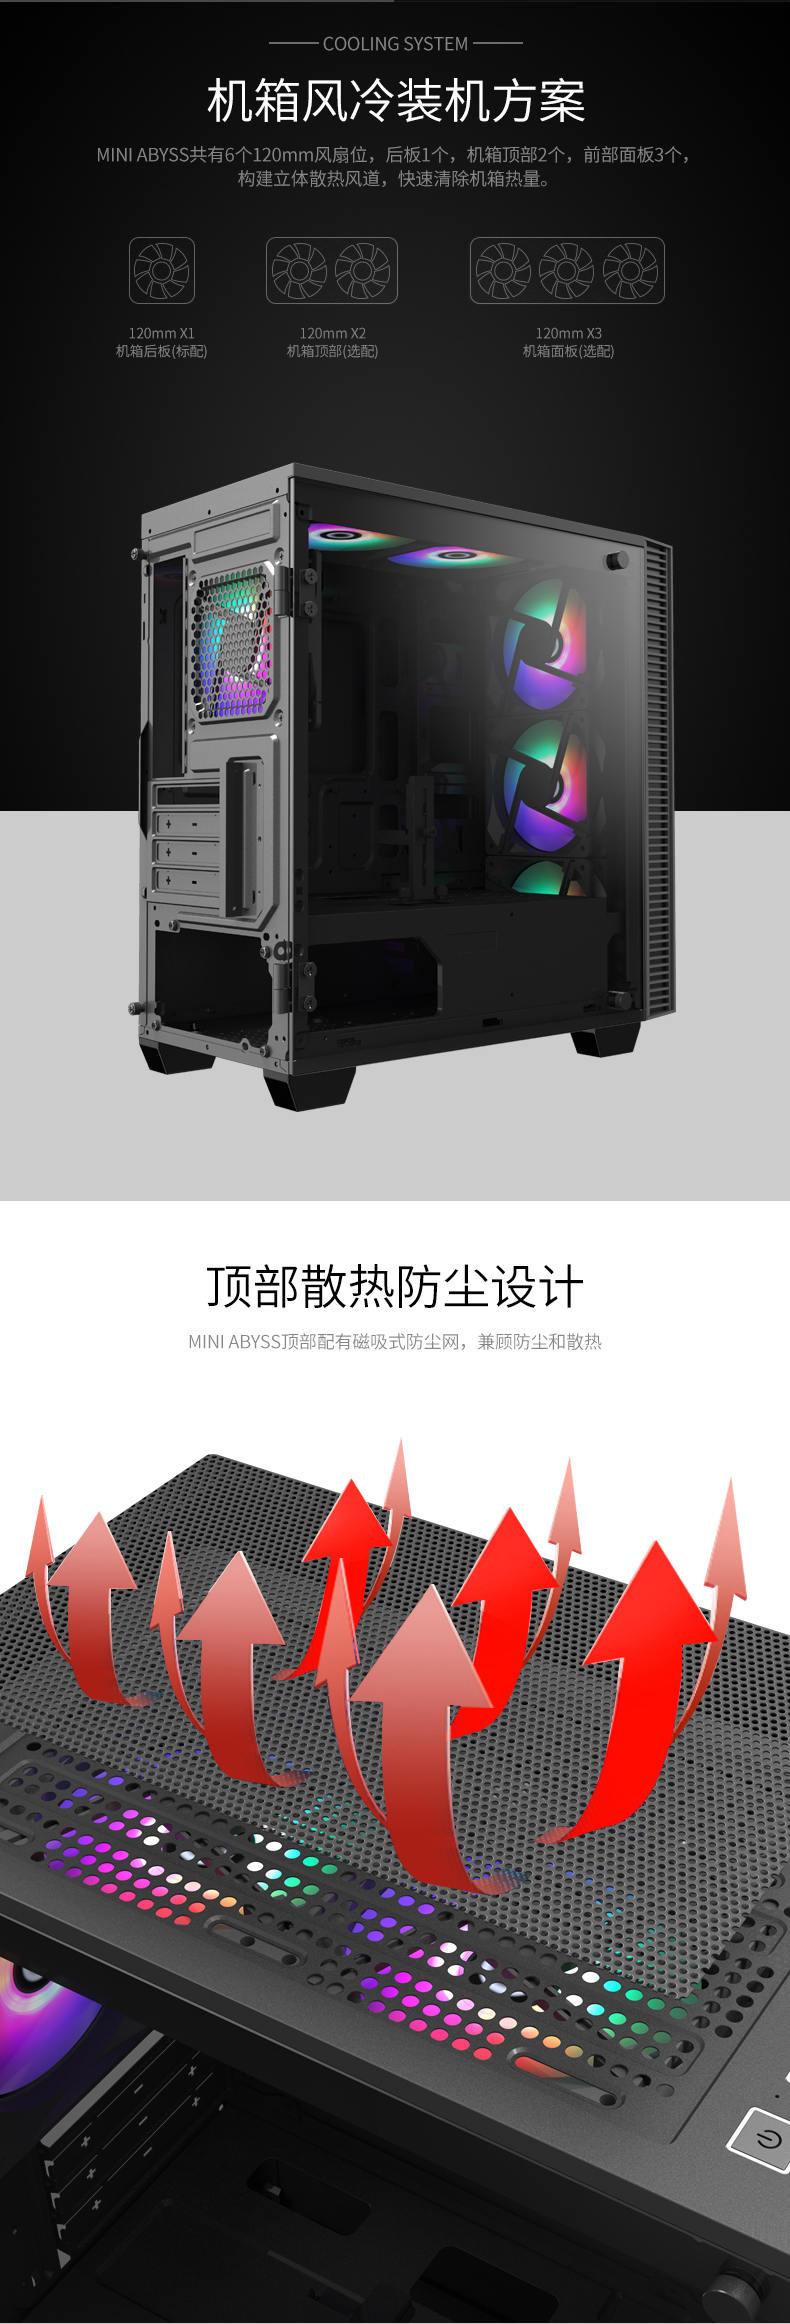 GAMEMAX_MINI-ABYSS-H608详情页中文_07.jpg